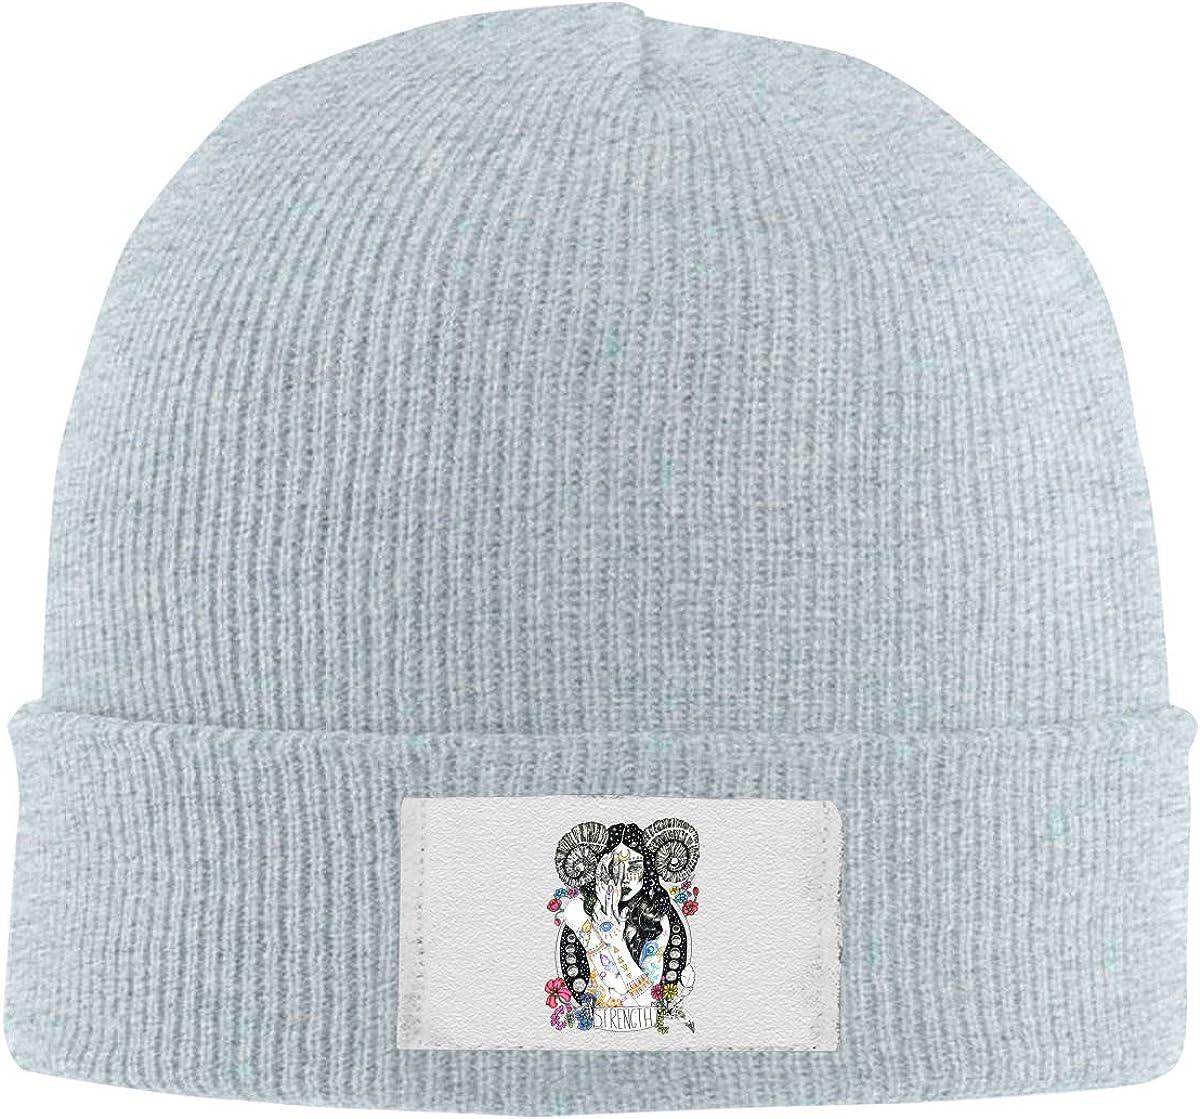 Stretchy Cuff Beanie Hat Black Dunpaiaa Skull Caps Strength Beaty Winter Warm Knit Hats